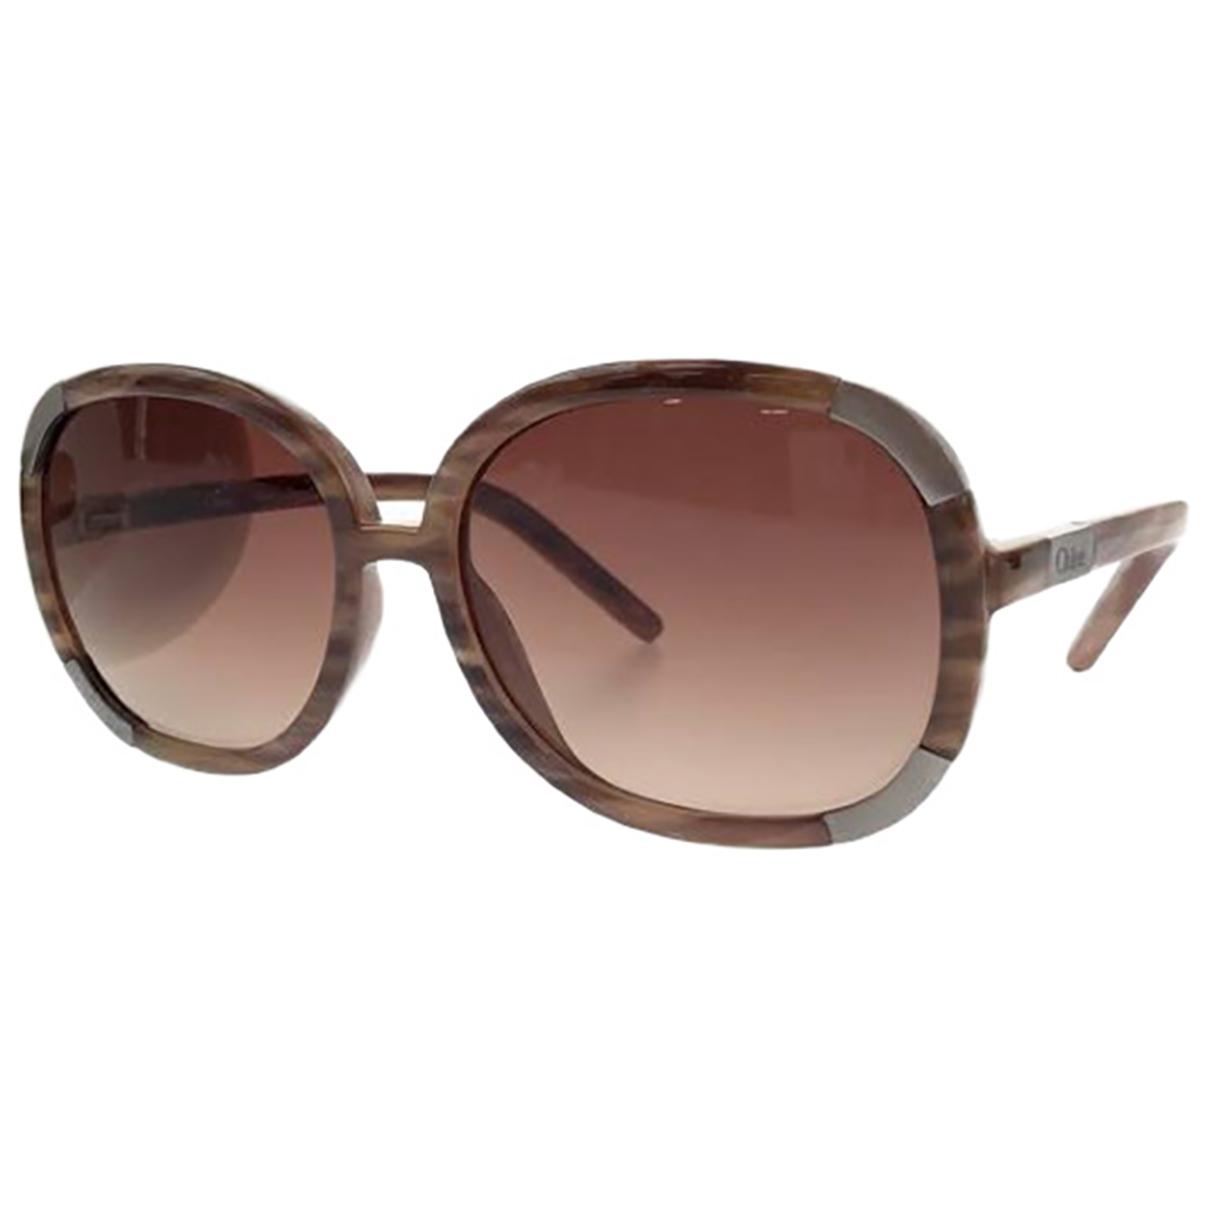 Chloé N Sunglasses for Women N